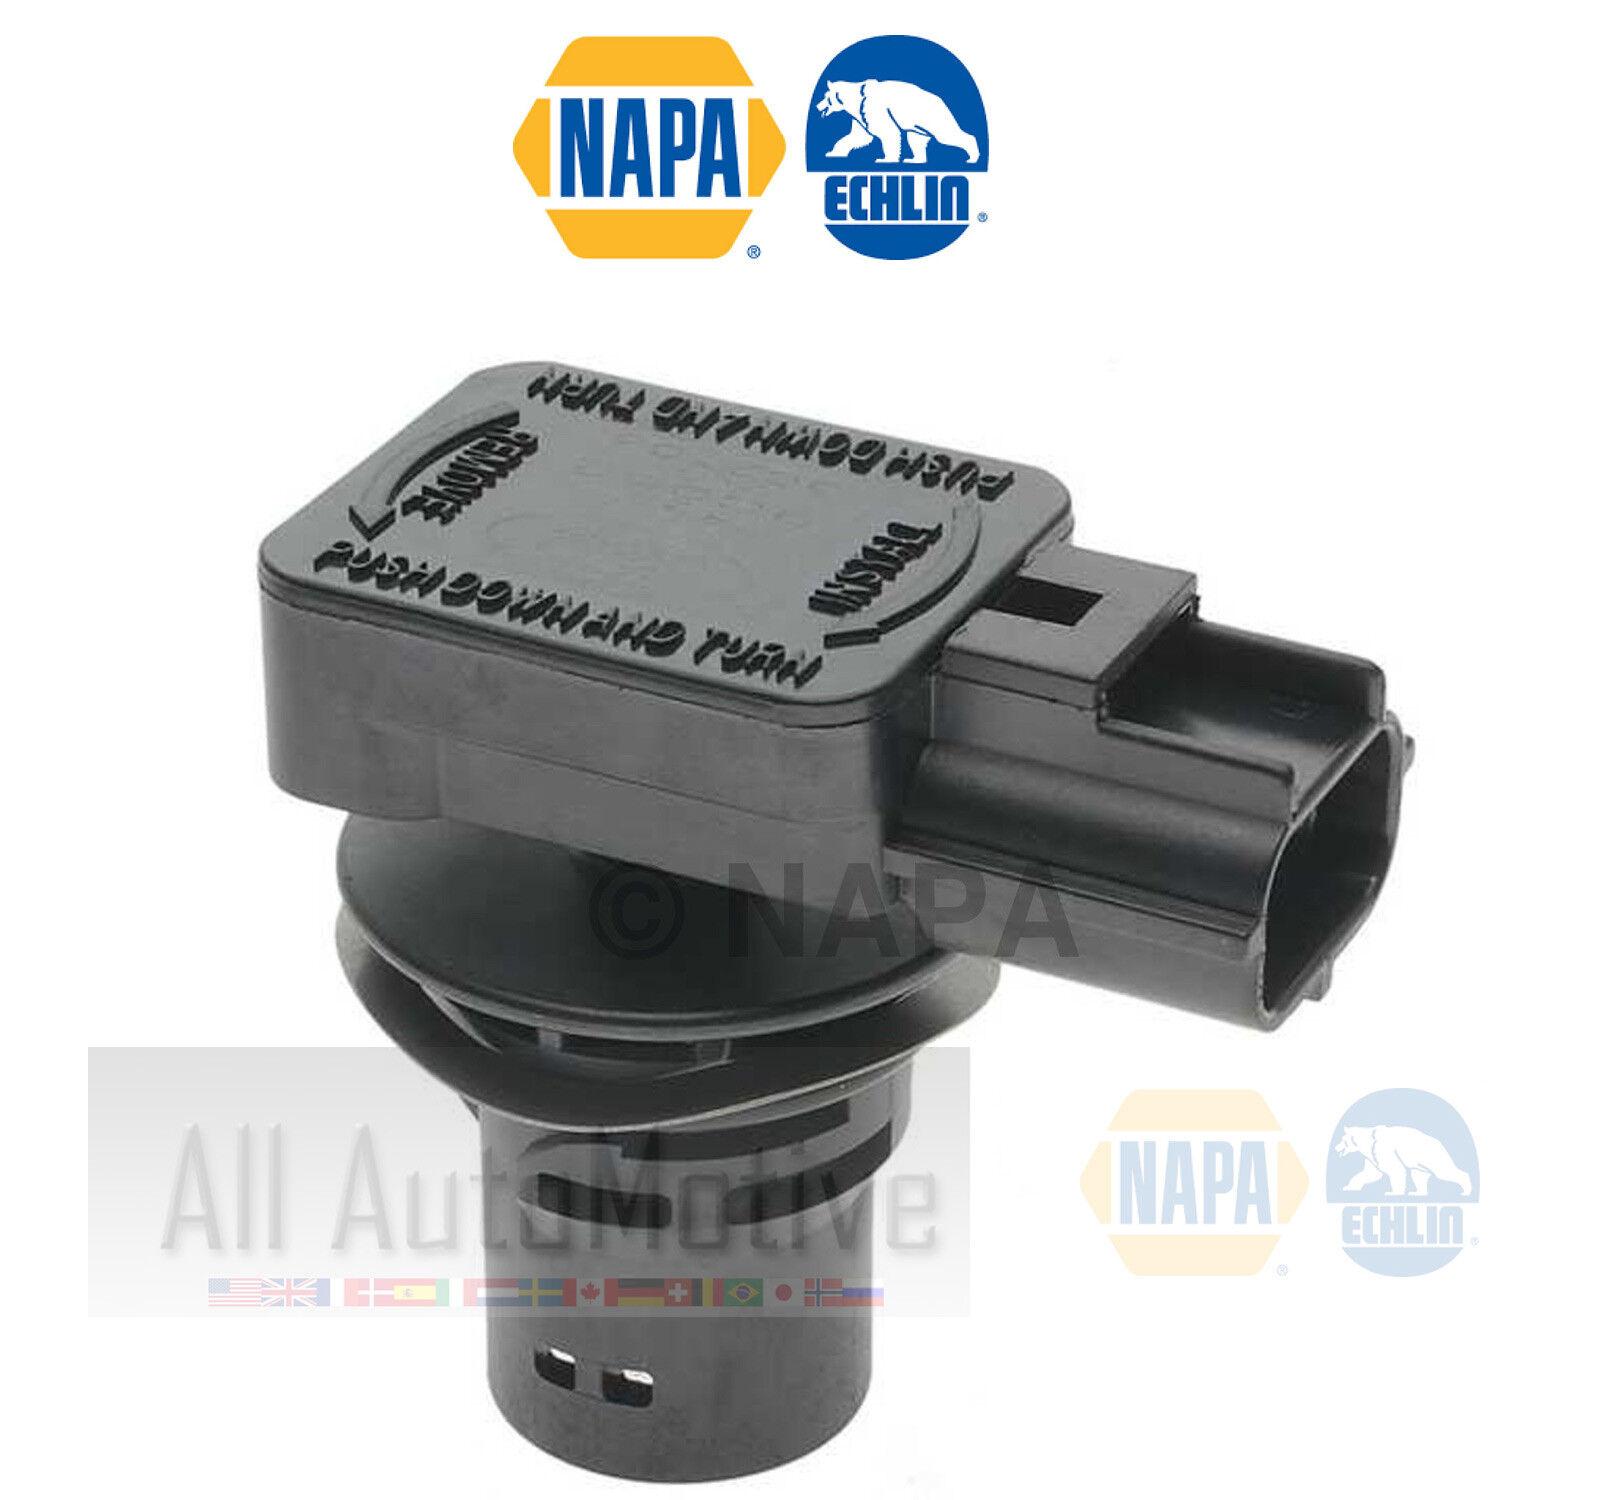 Fuel Tank Pressure Sensor Napa 227022 Ebay Wiring Harness Norton Secured Powered By Verisign